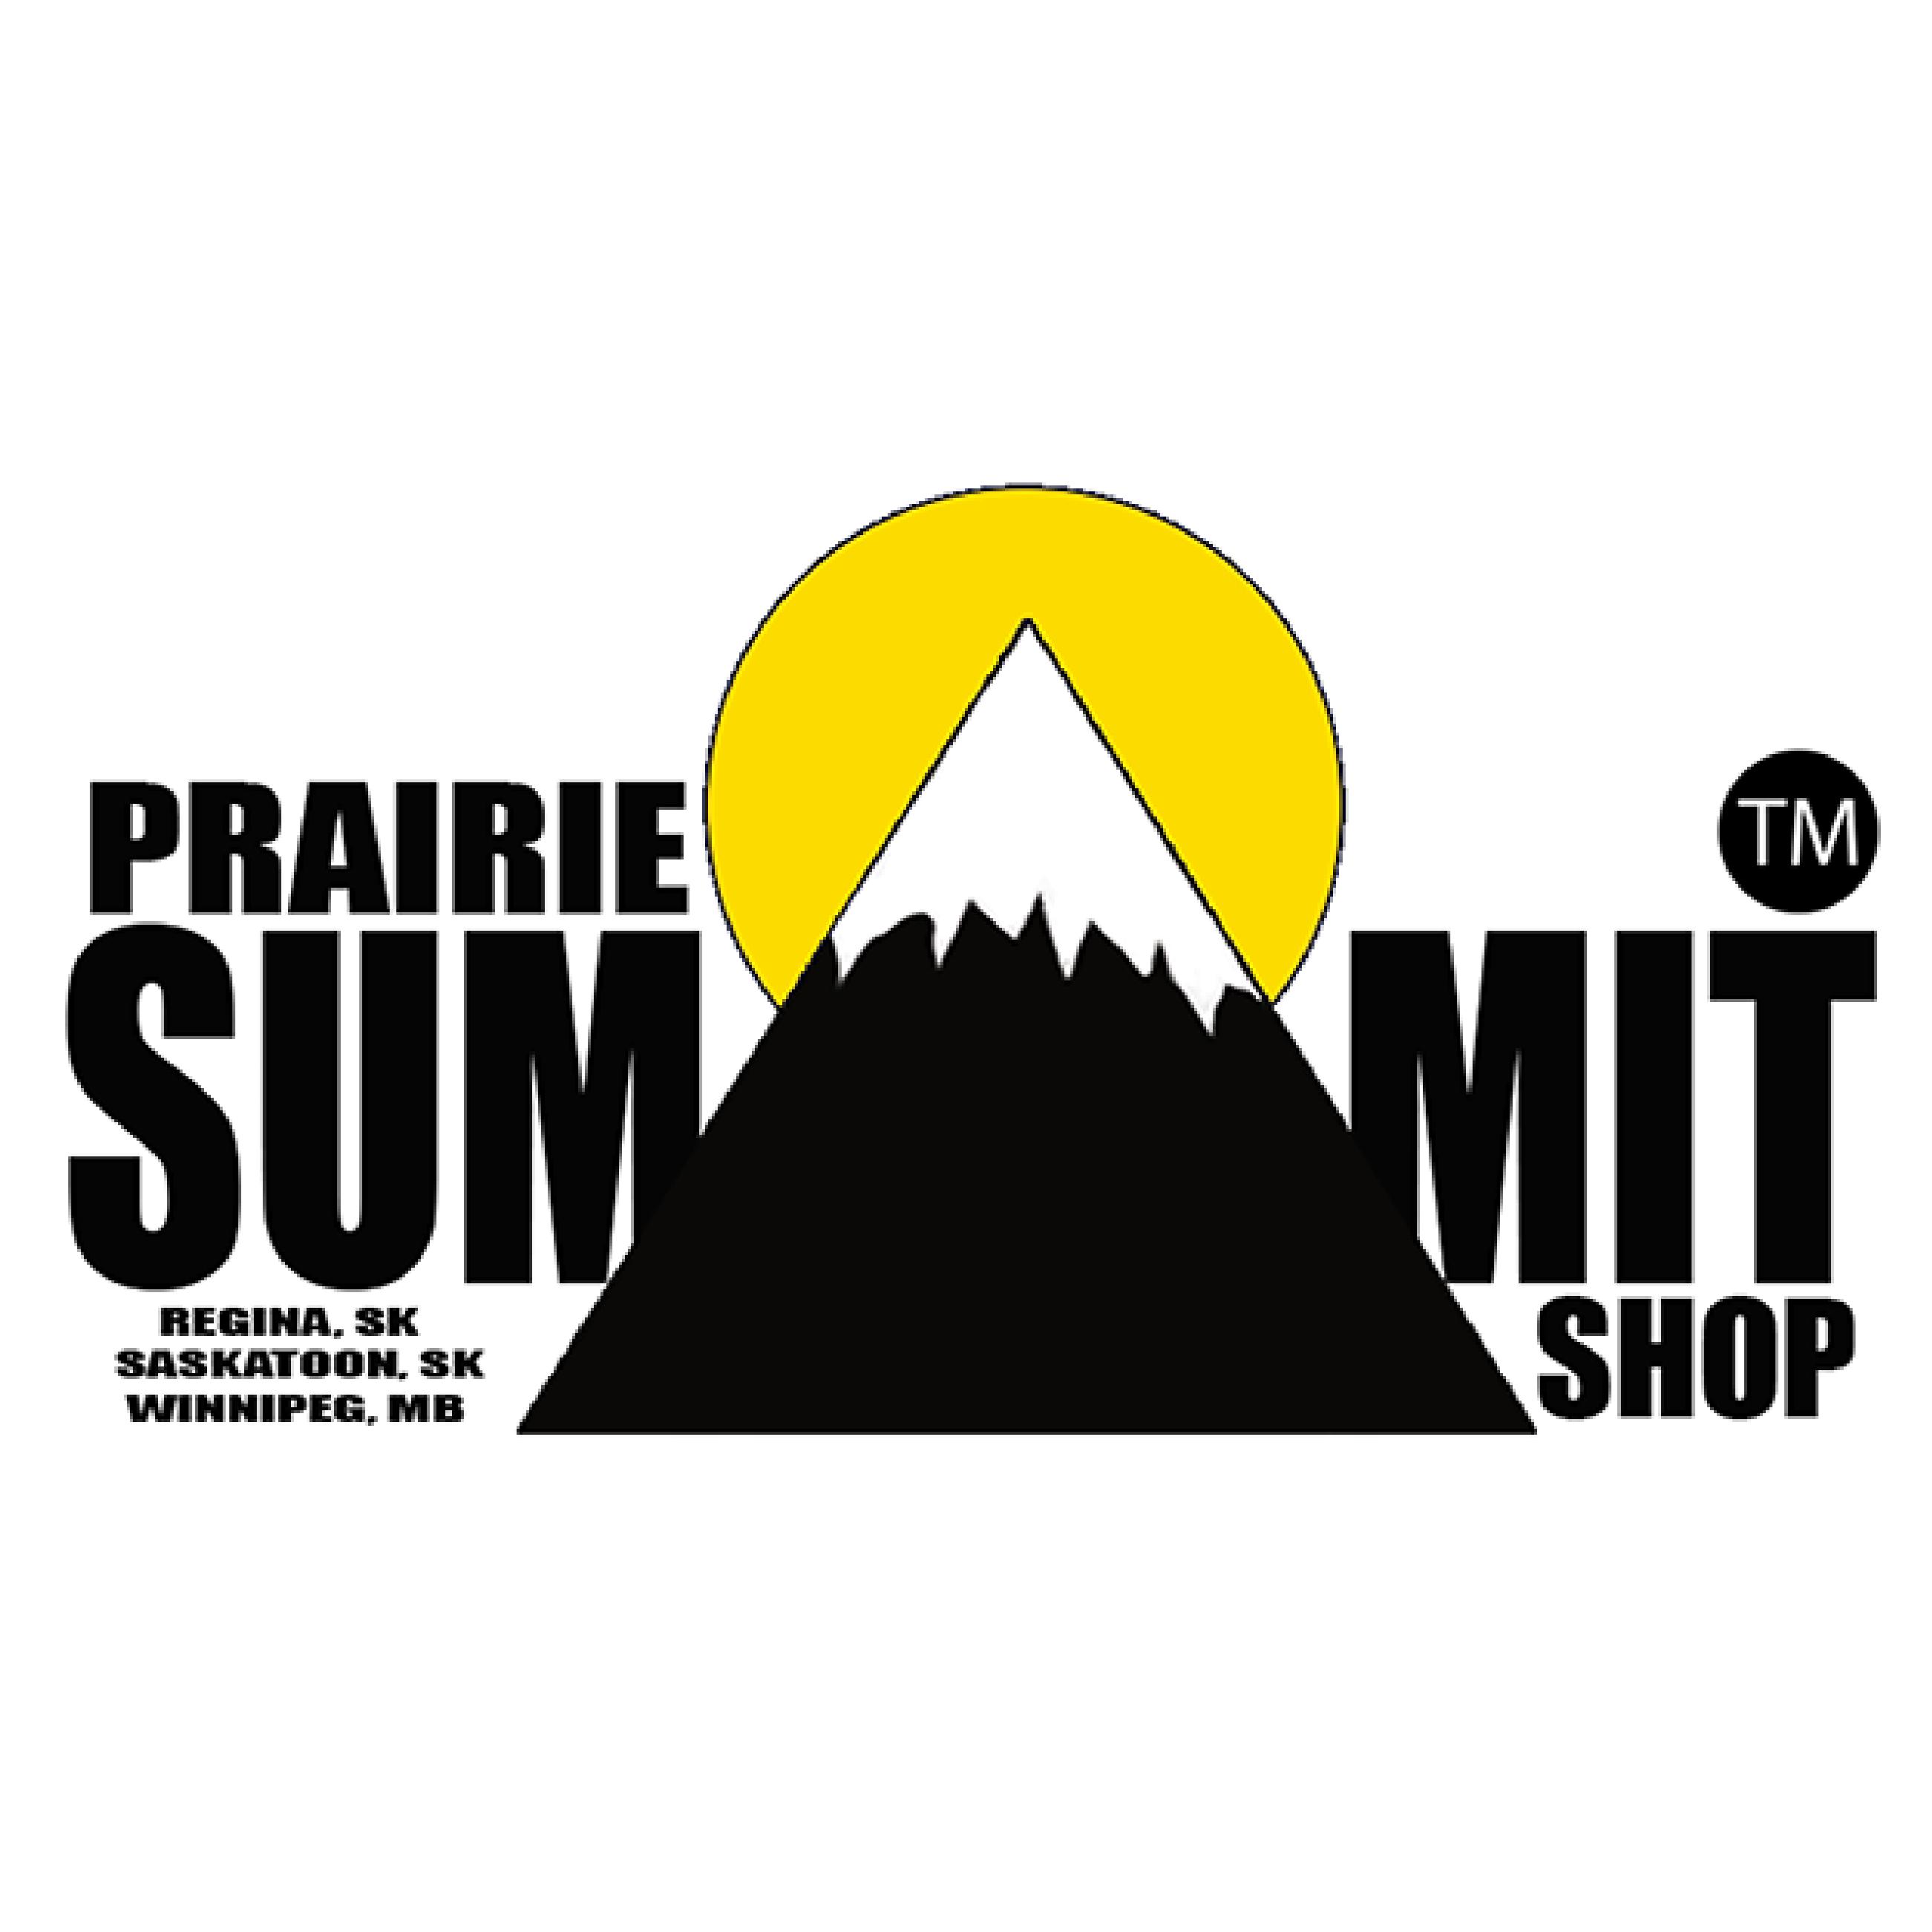 prairie summit shop it s all part of the adventure